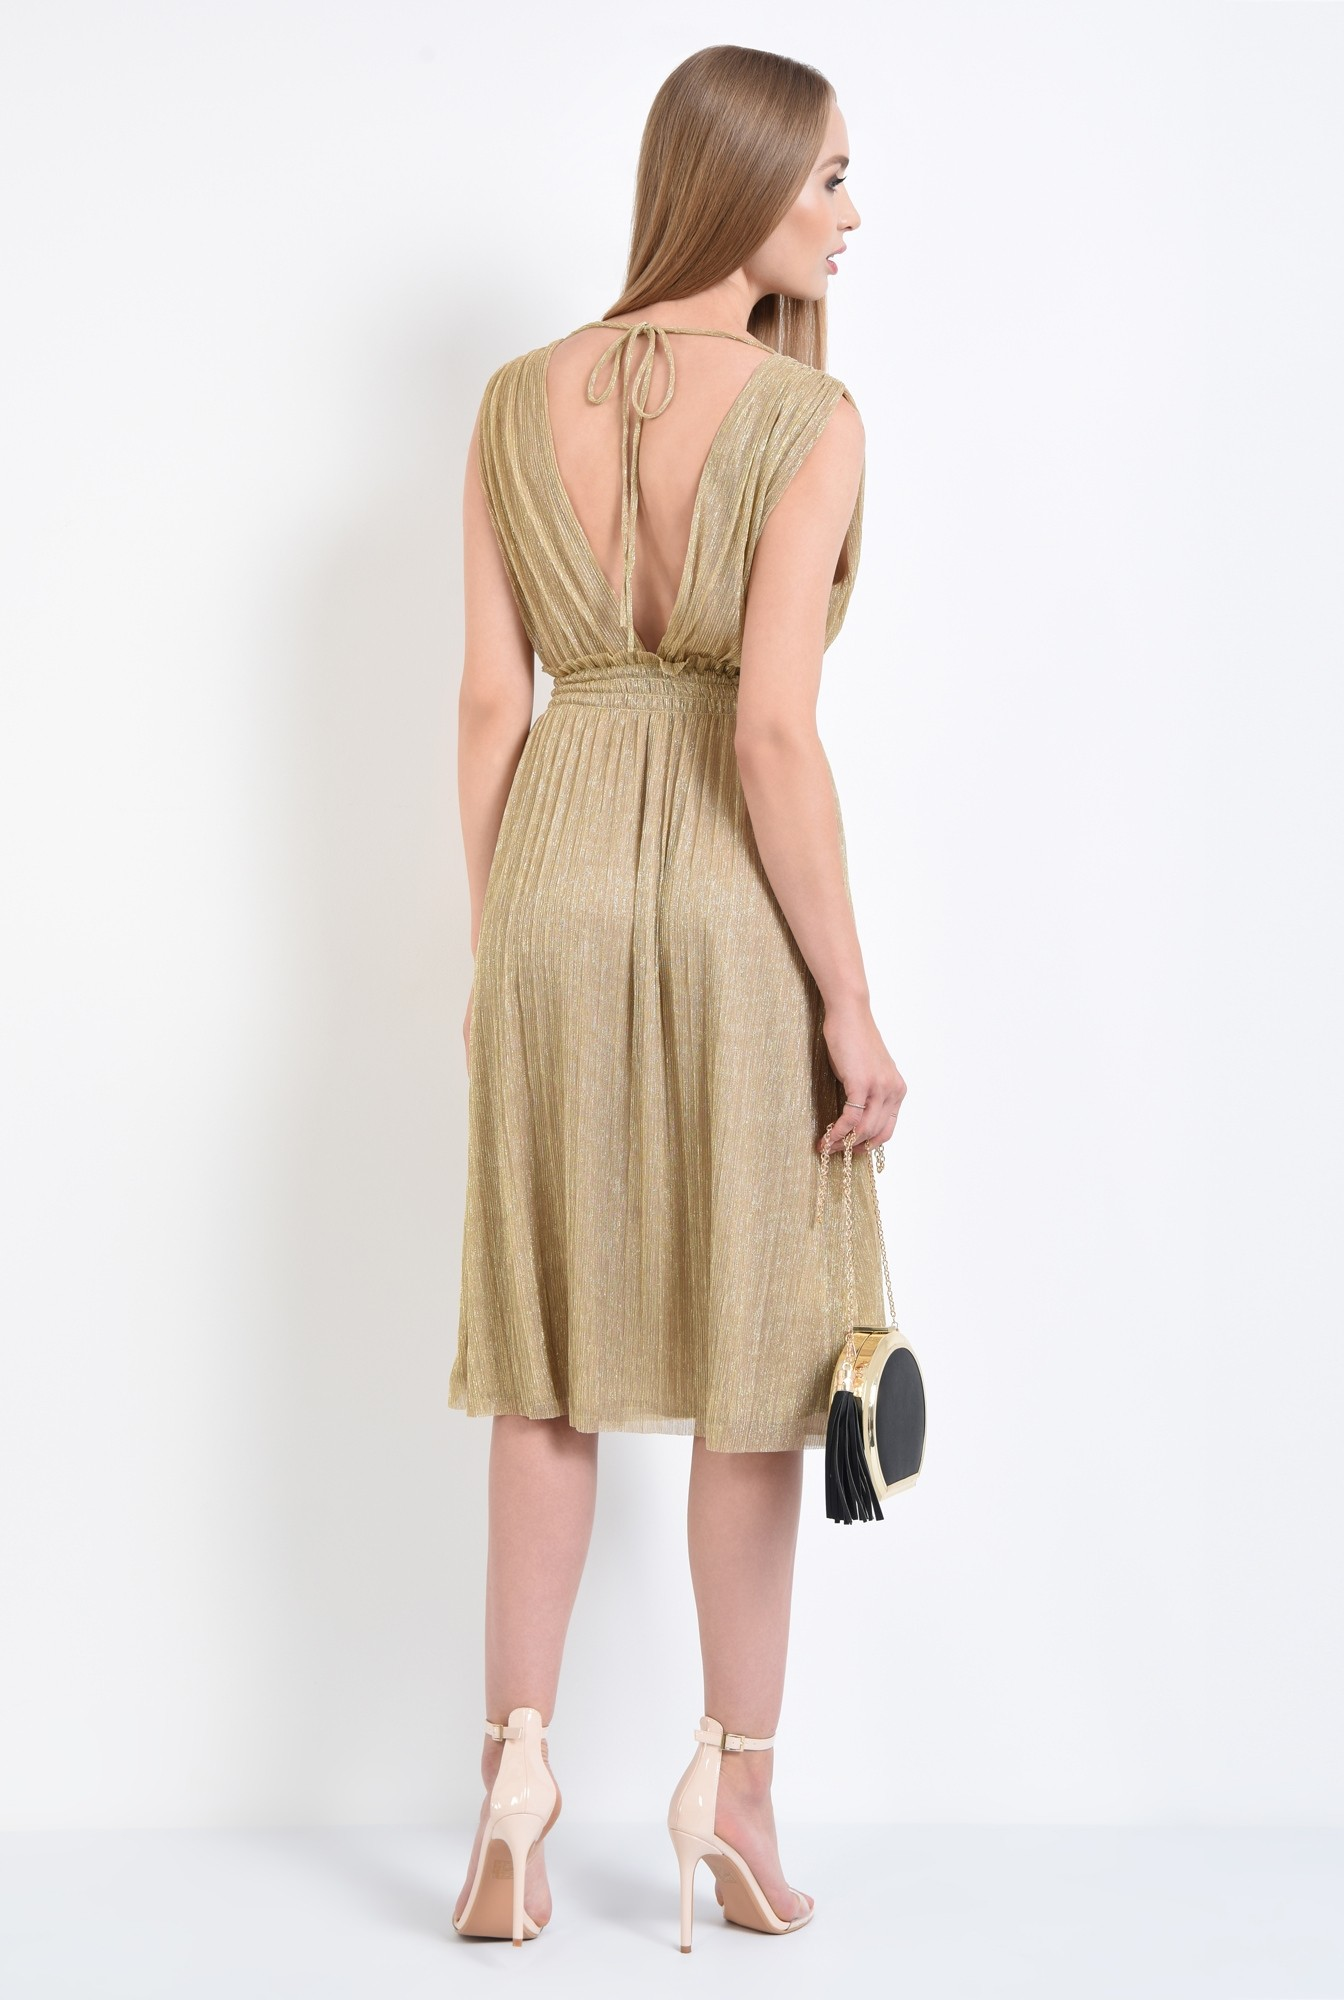 1 - rochie de ocazie, lurex, auriu, spate decoltat